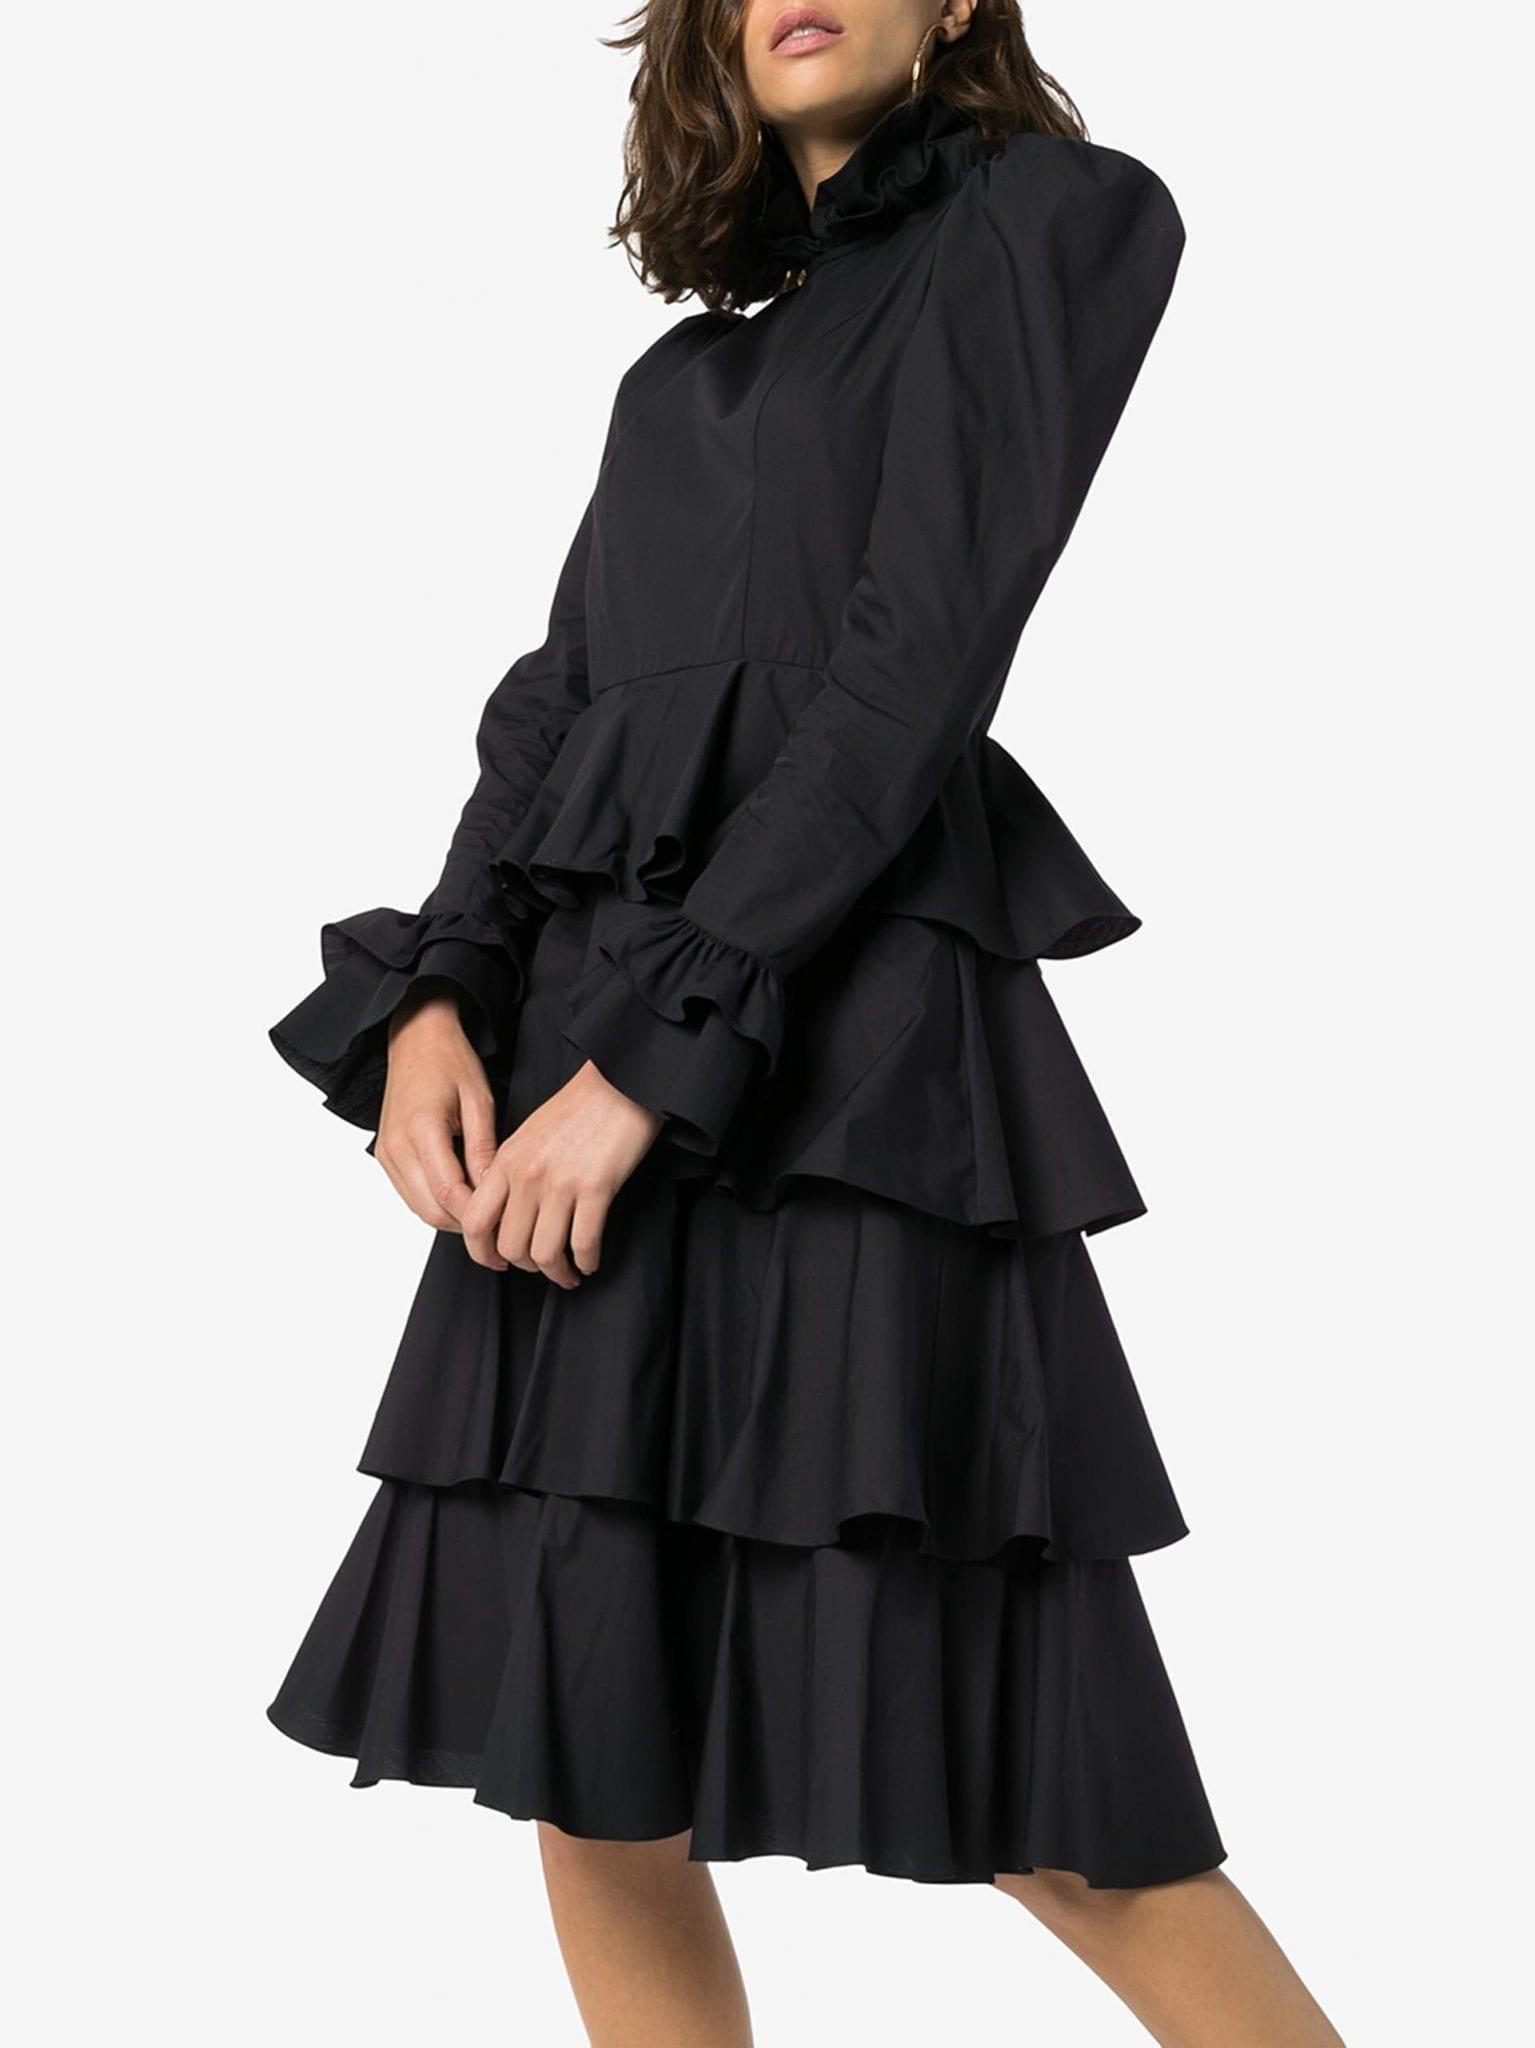 BATSHEVA Confection High Neck Tiered Dress